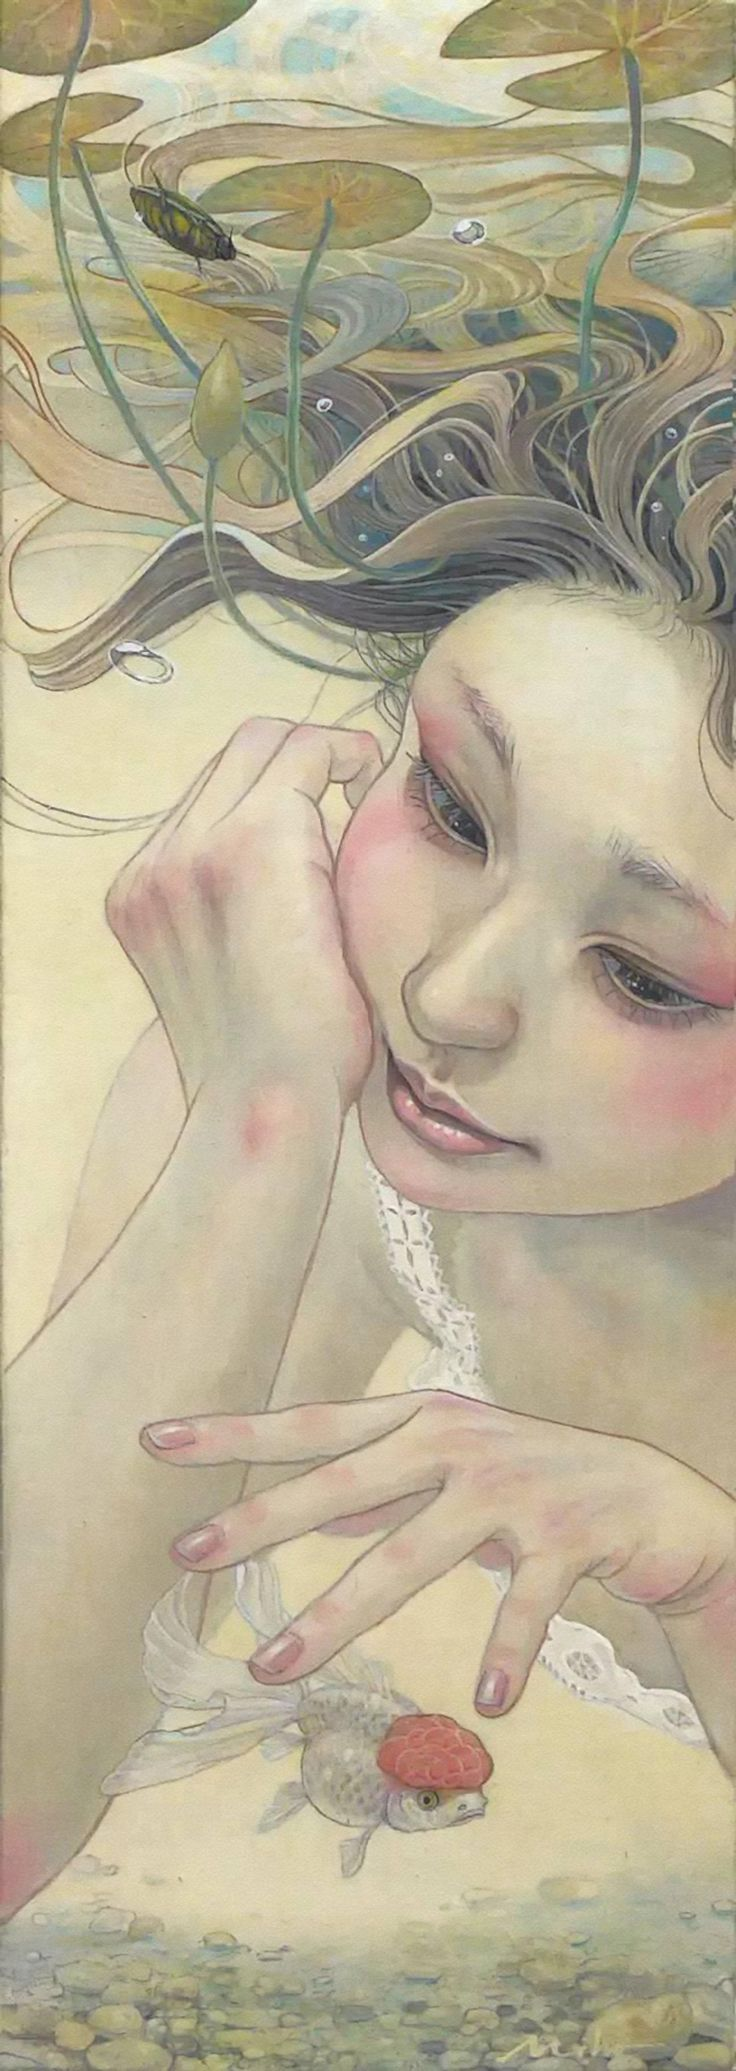 """Heart of Water"" - Miho Hirano 平野実穂, watercolor, 2015 {beautiful female head hands underwater woman face portrait painting #loveart #2good2btrue} mihohirano.strikingly.com"